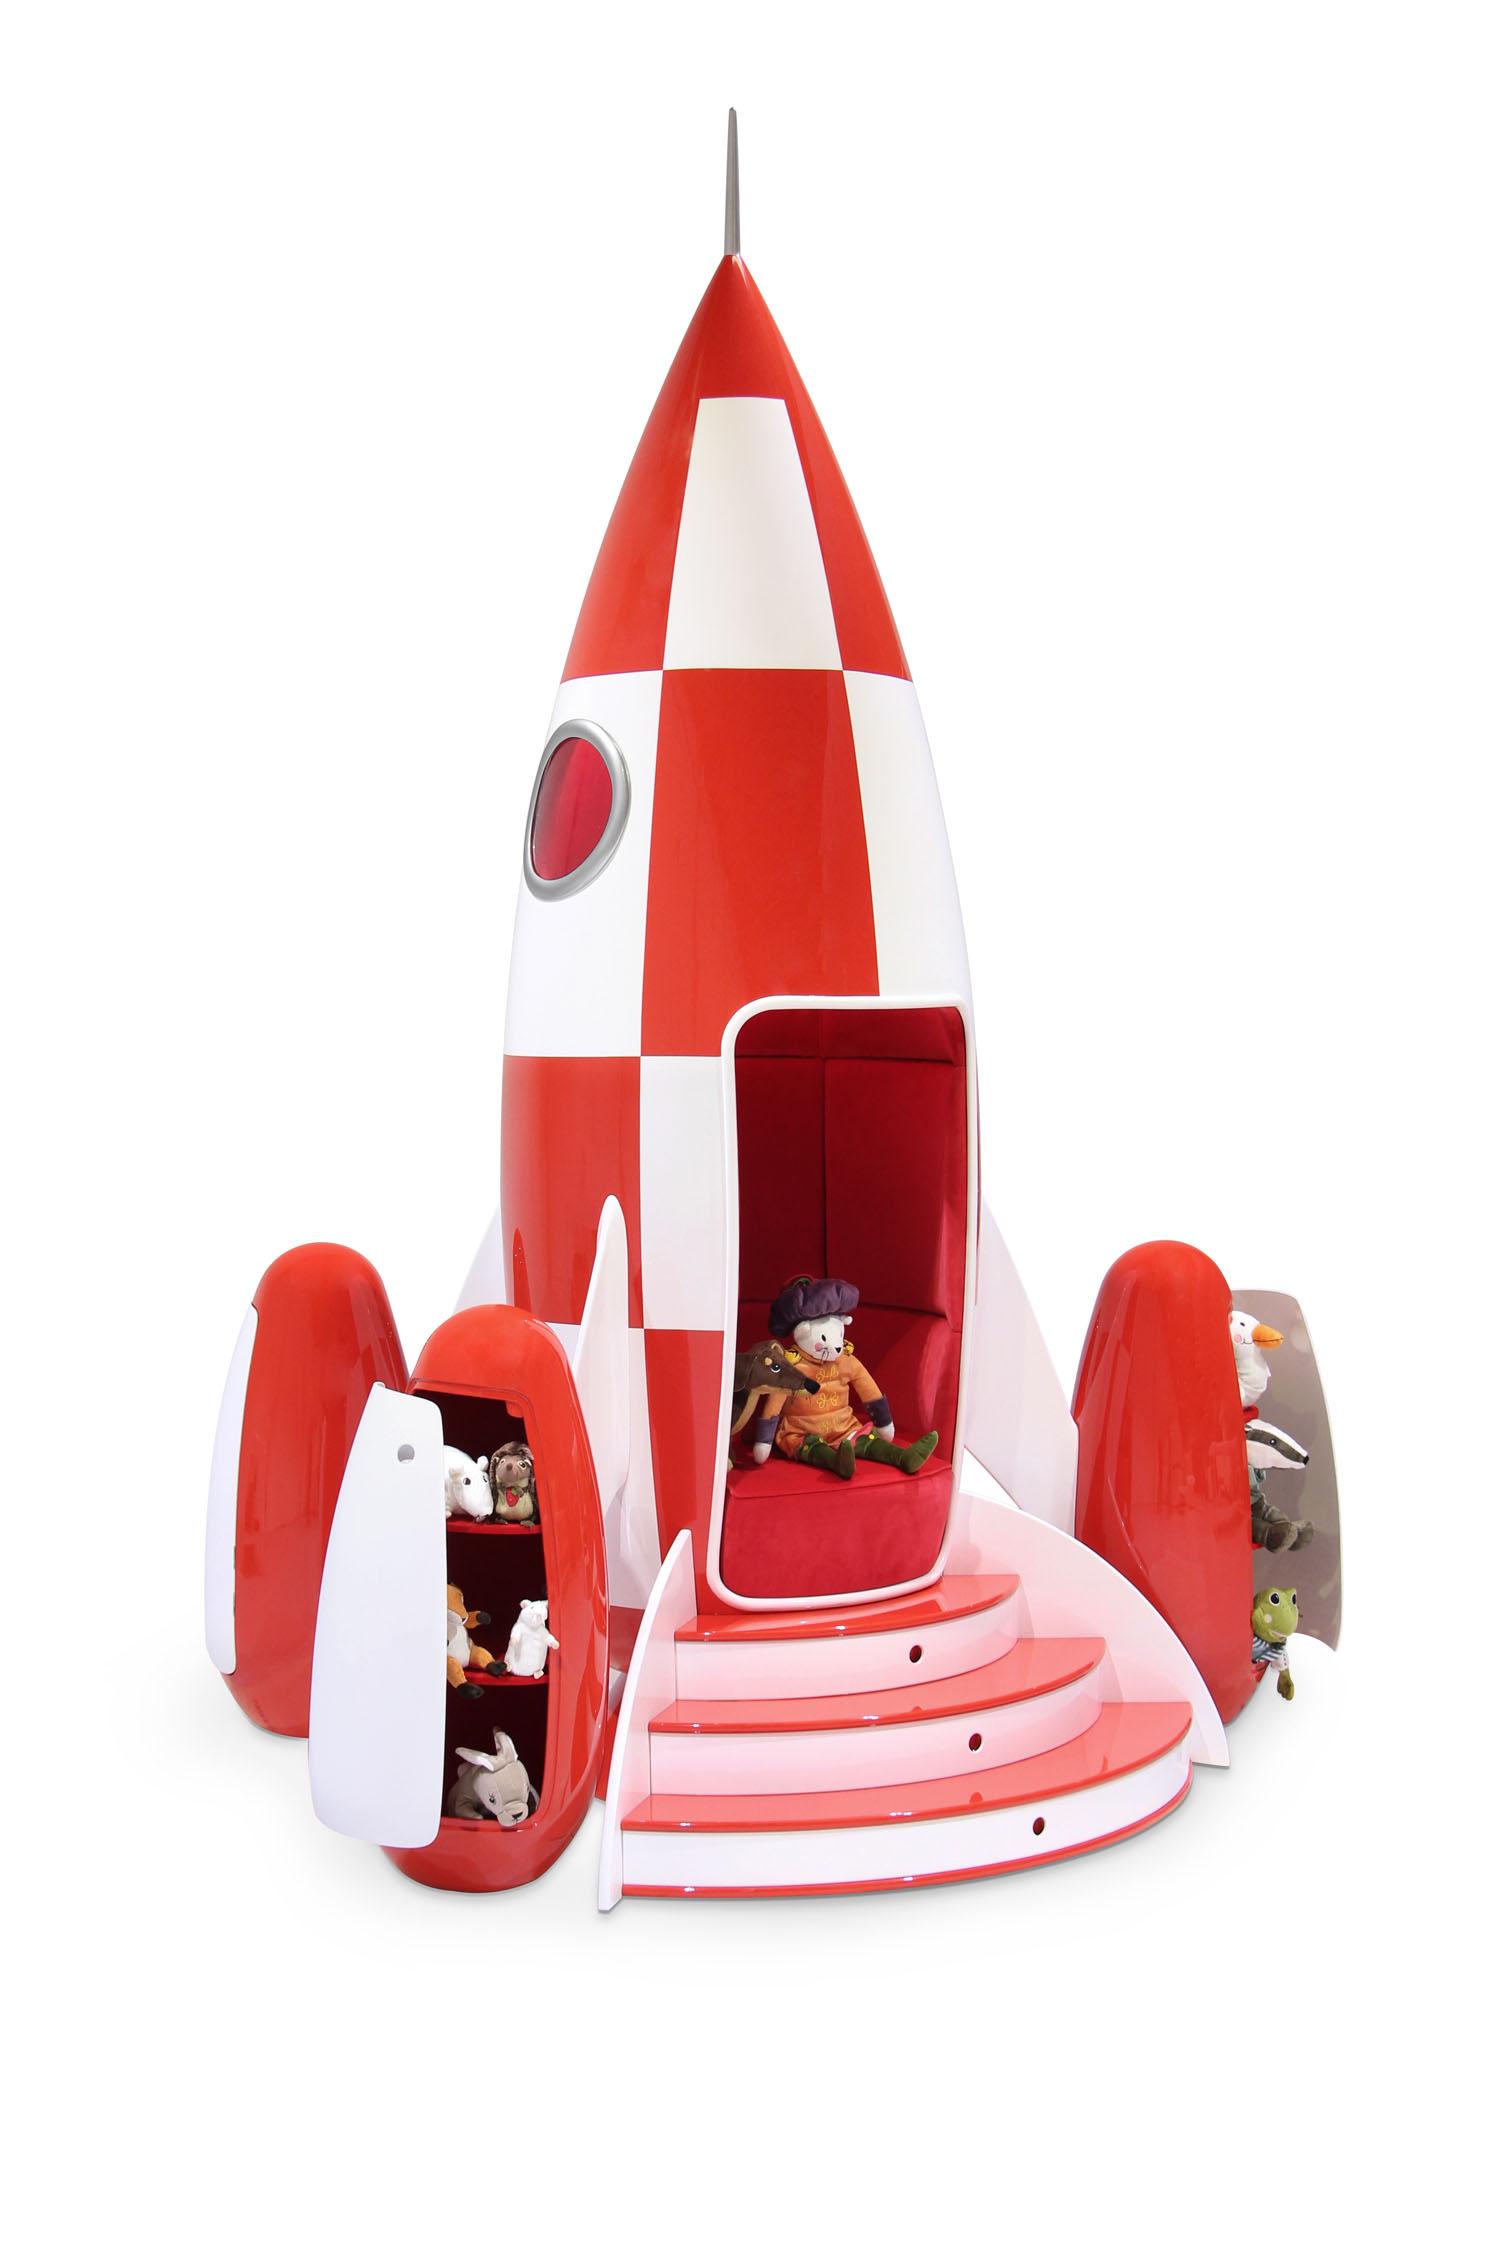 rocky-rocket-circu-magical-furniture-jpg